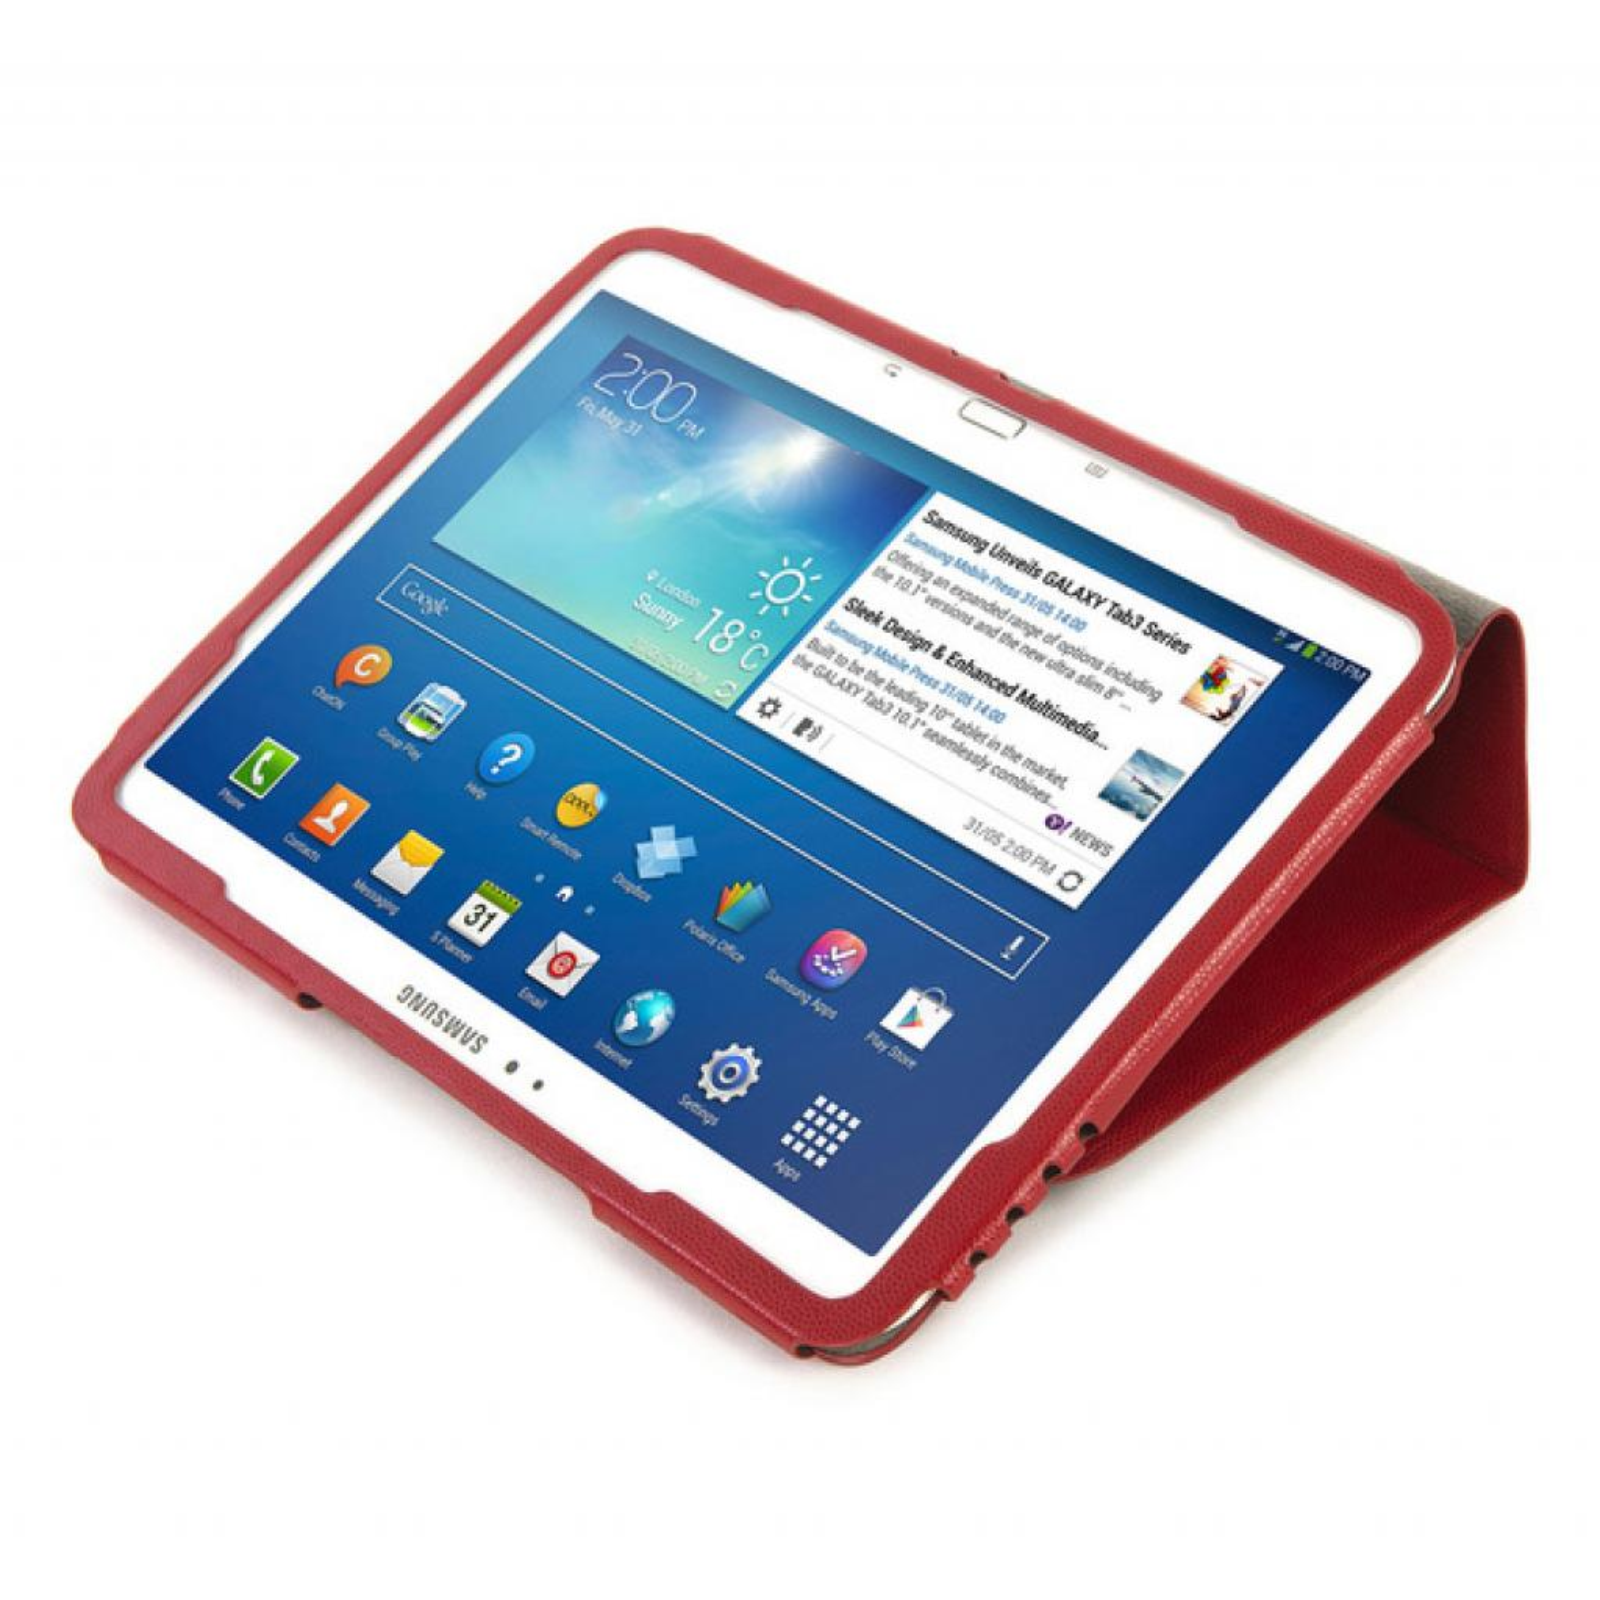 Чехол для планшета Tucano Galaxy Tab 3 10.1 Leggero Red (TAB-LS310-R) изображение 6